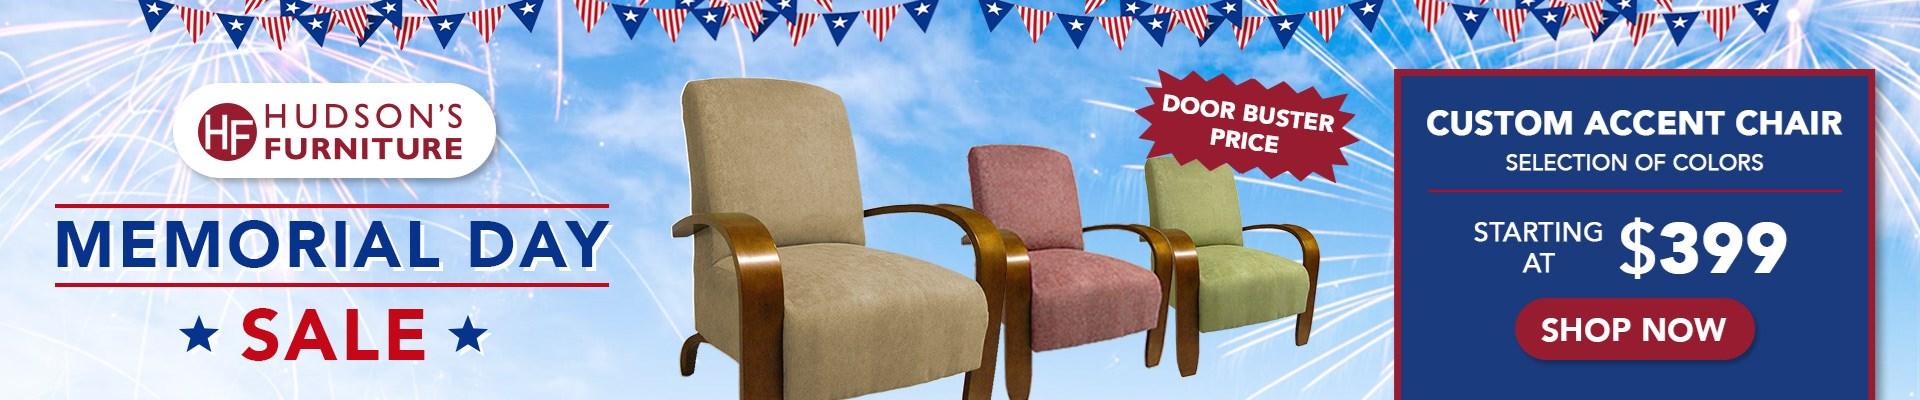 Memorial Day Hudson's Furniture Sale